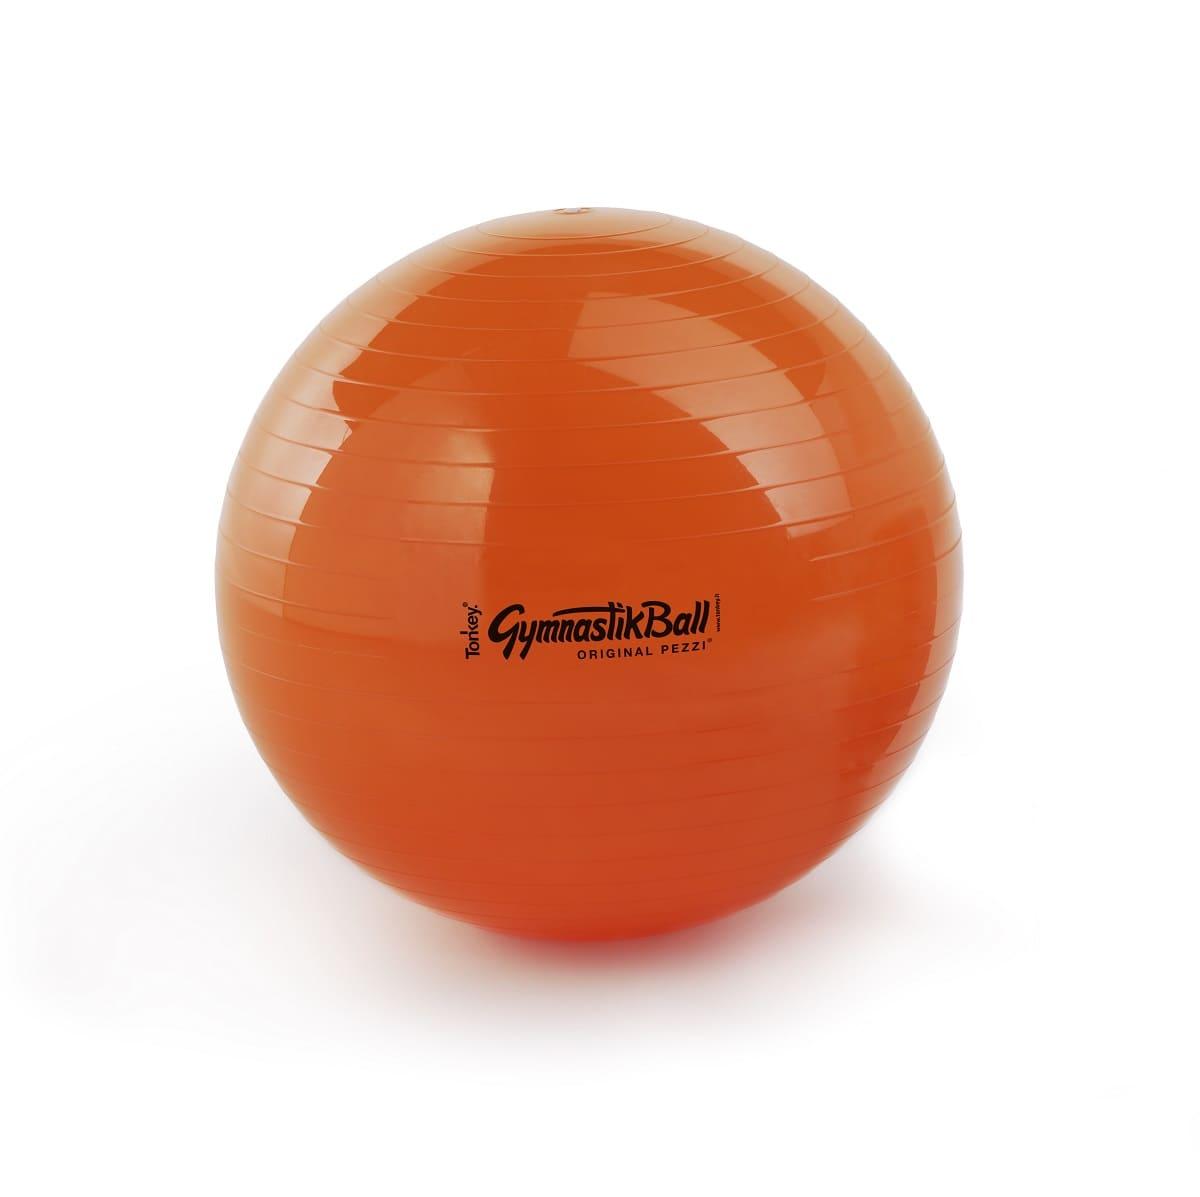 LEDRAGOMMA ORIGINAL PEZZI GYMNASTIK BALL ORANGE 53CM